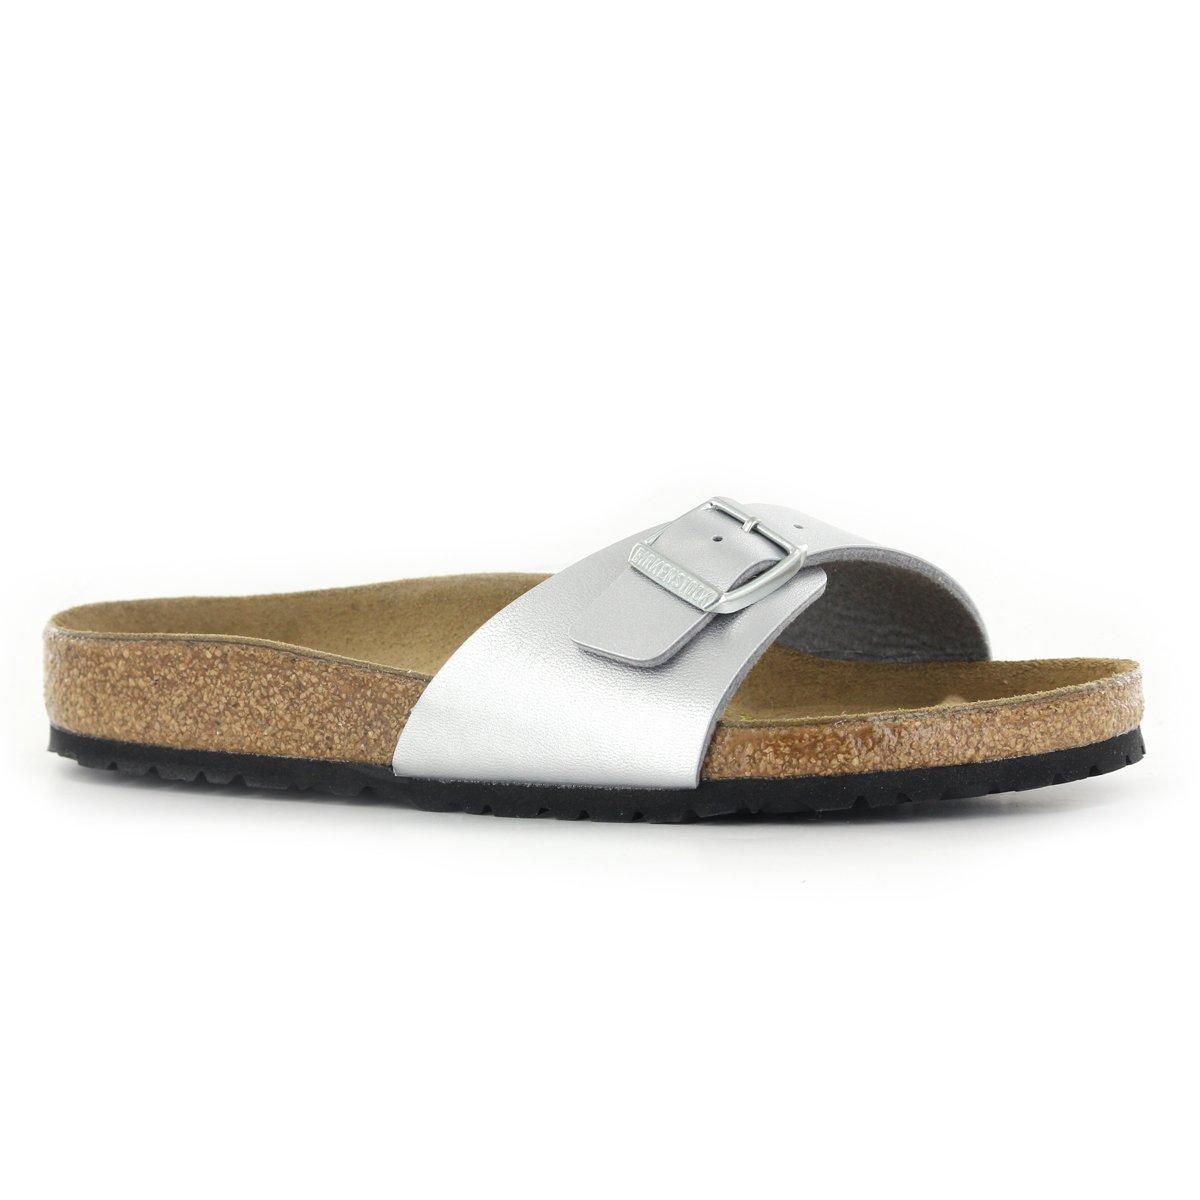 galleon birkenstock madrid silver womens sandals 40 eu. Black Bedroom Furniture Sets. Home Design Ideas